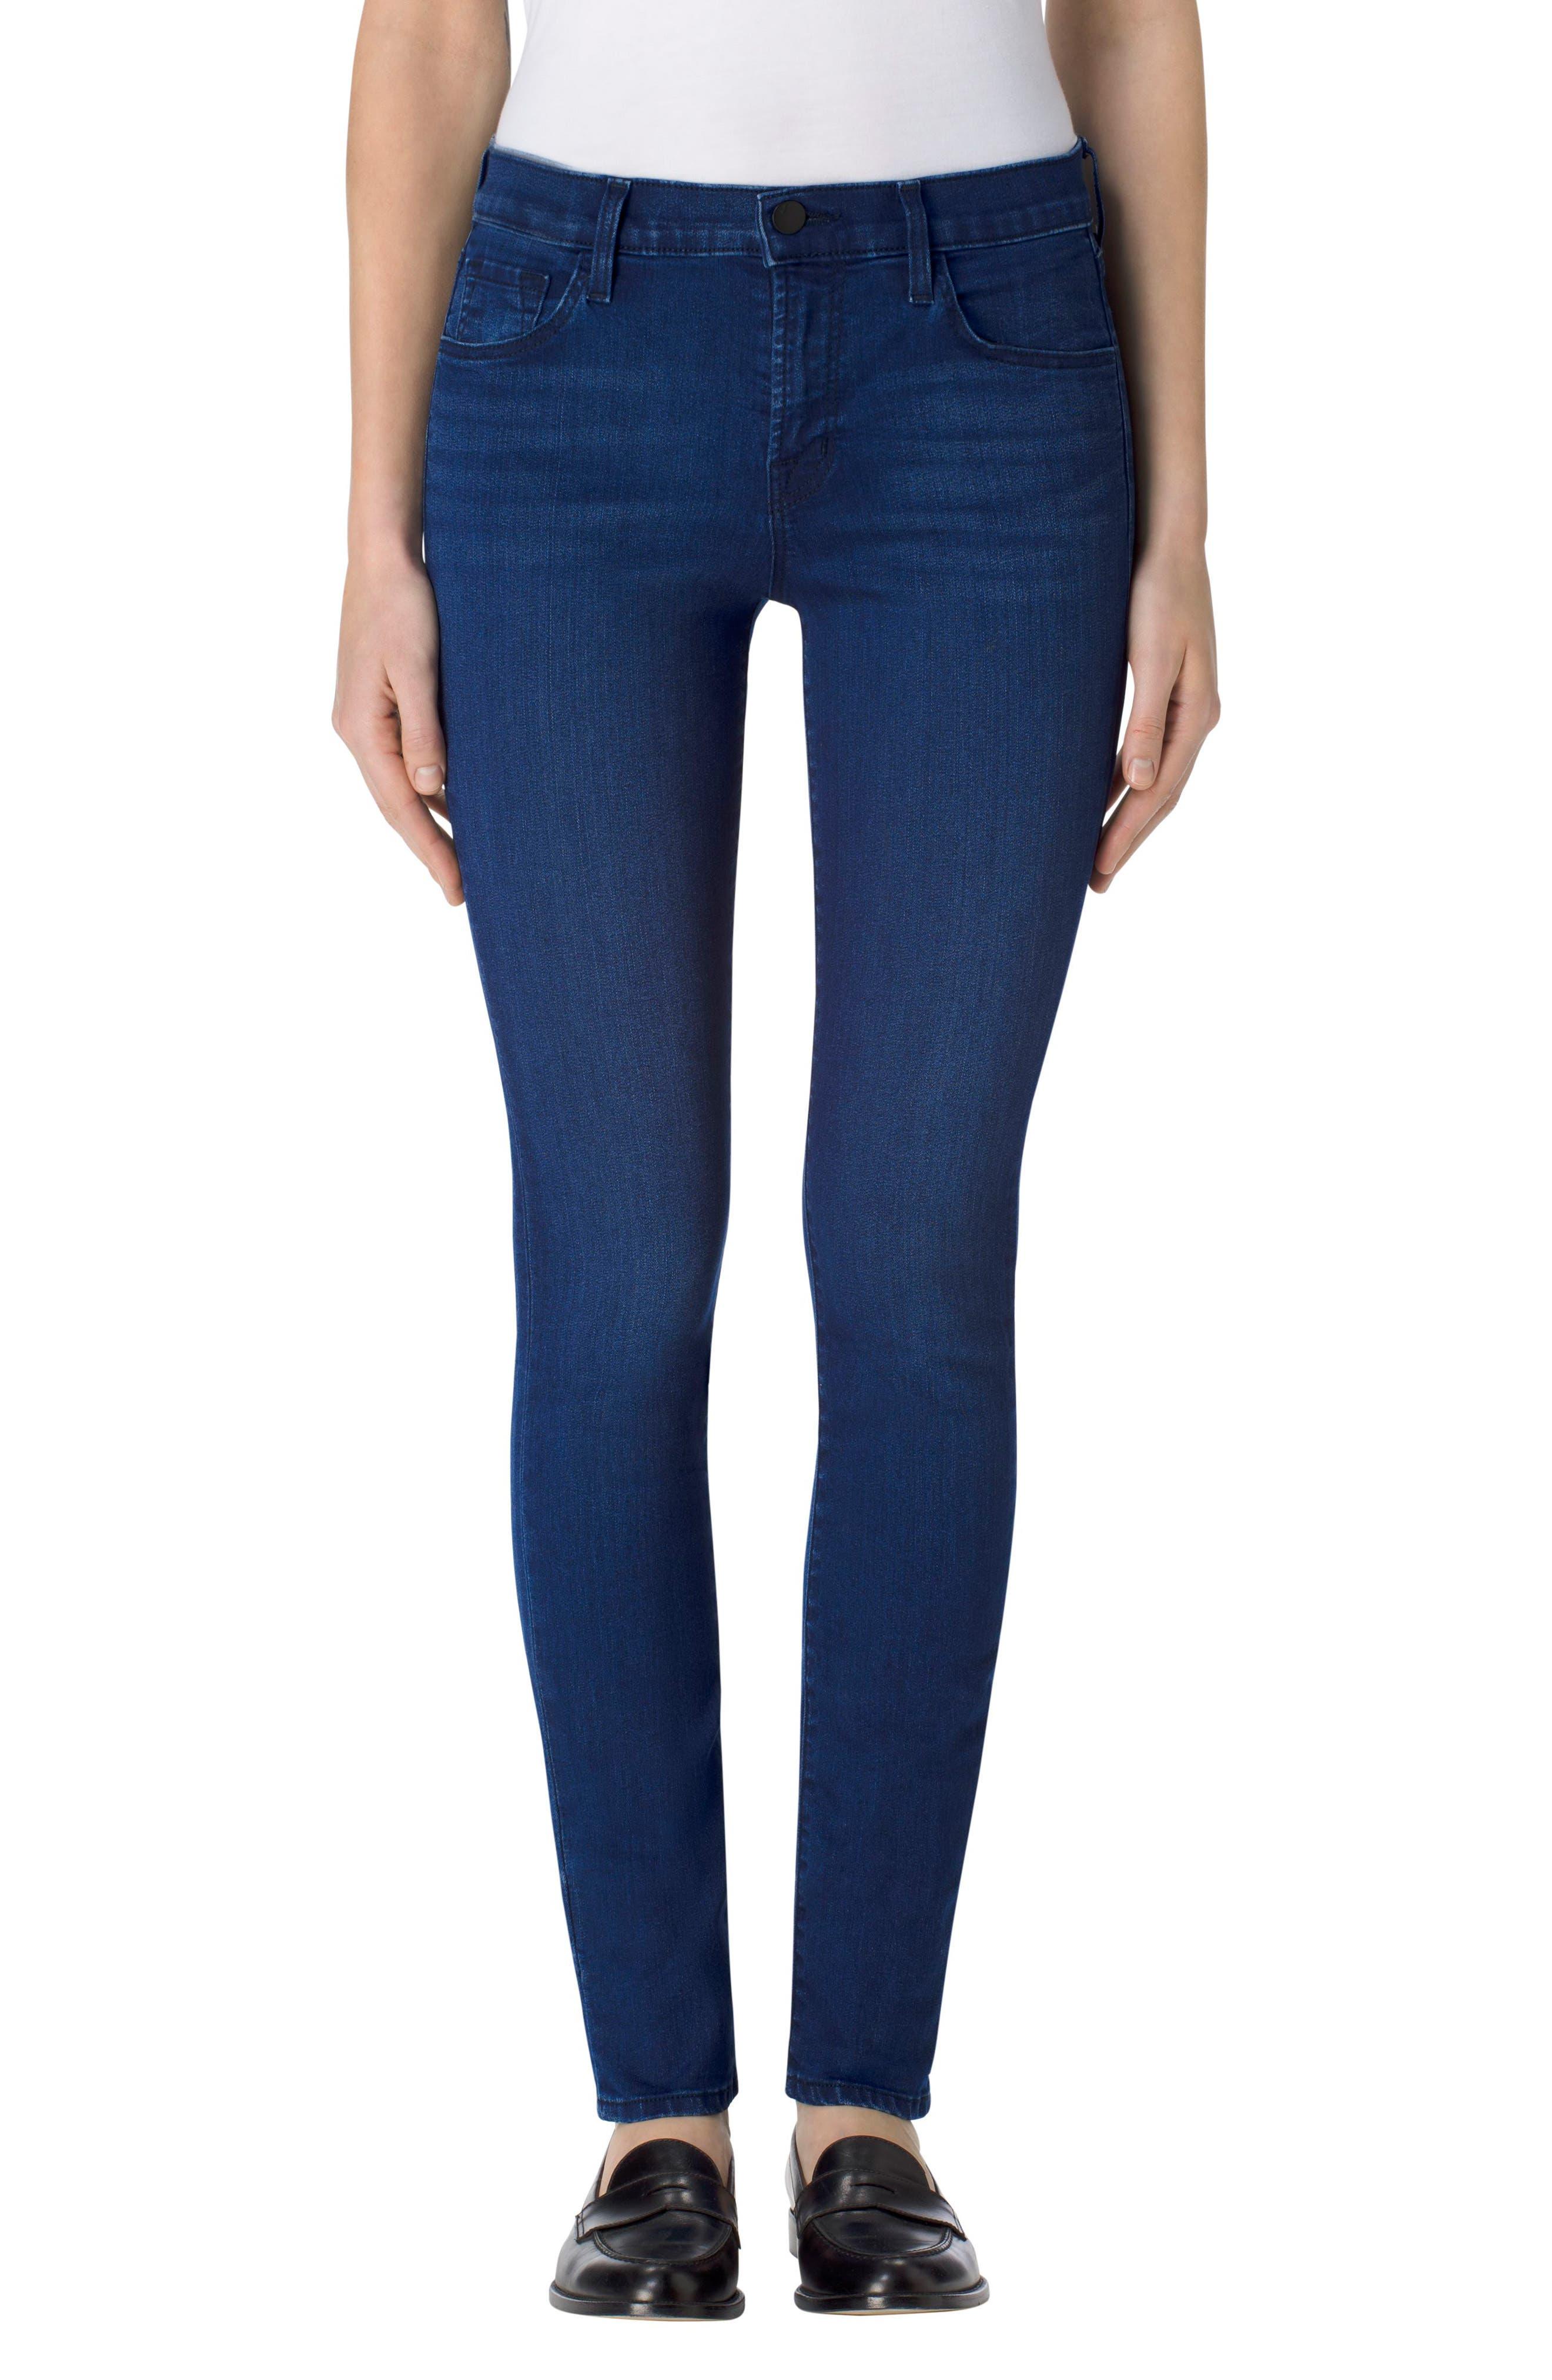 Main Image - J Brand '811' Ankle Skinny Jeans (Sway)